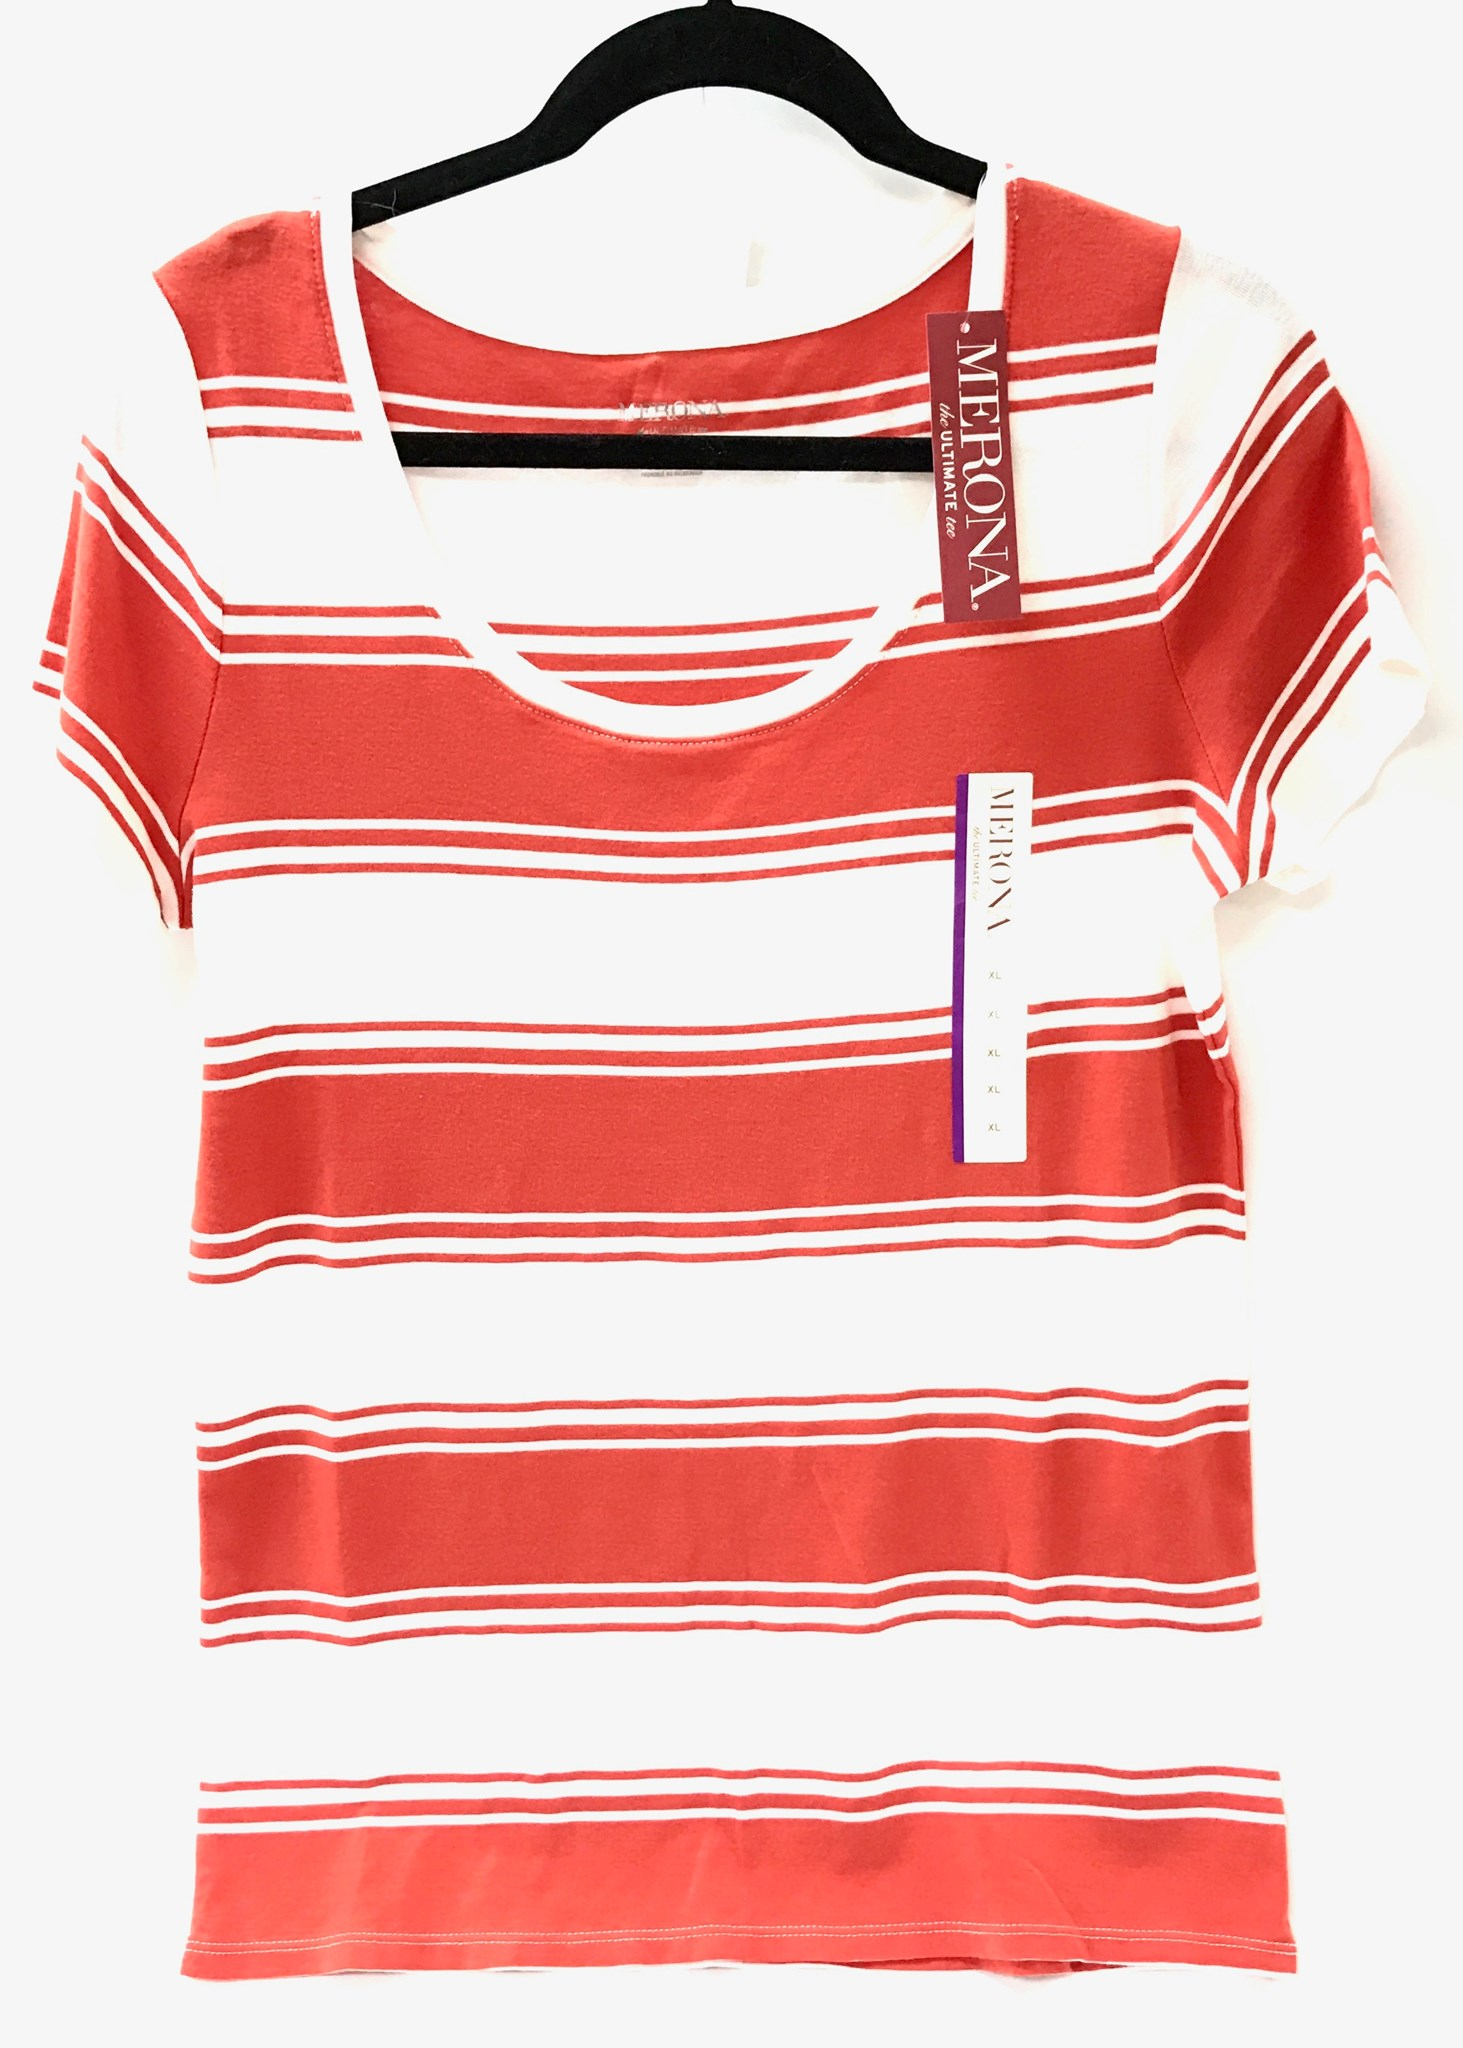 Scoop Neck Ladies Shirt Org/Wht Size X-Large